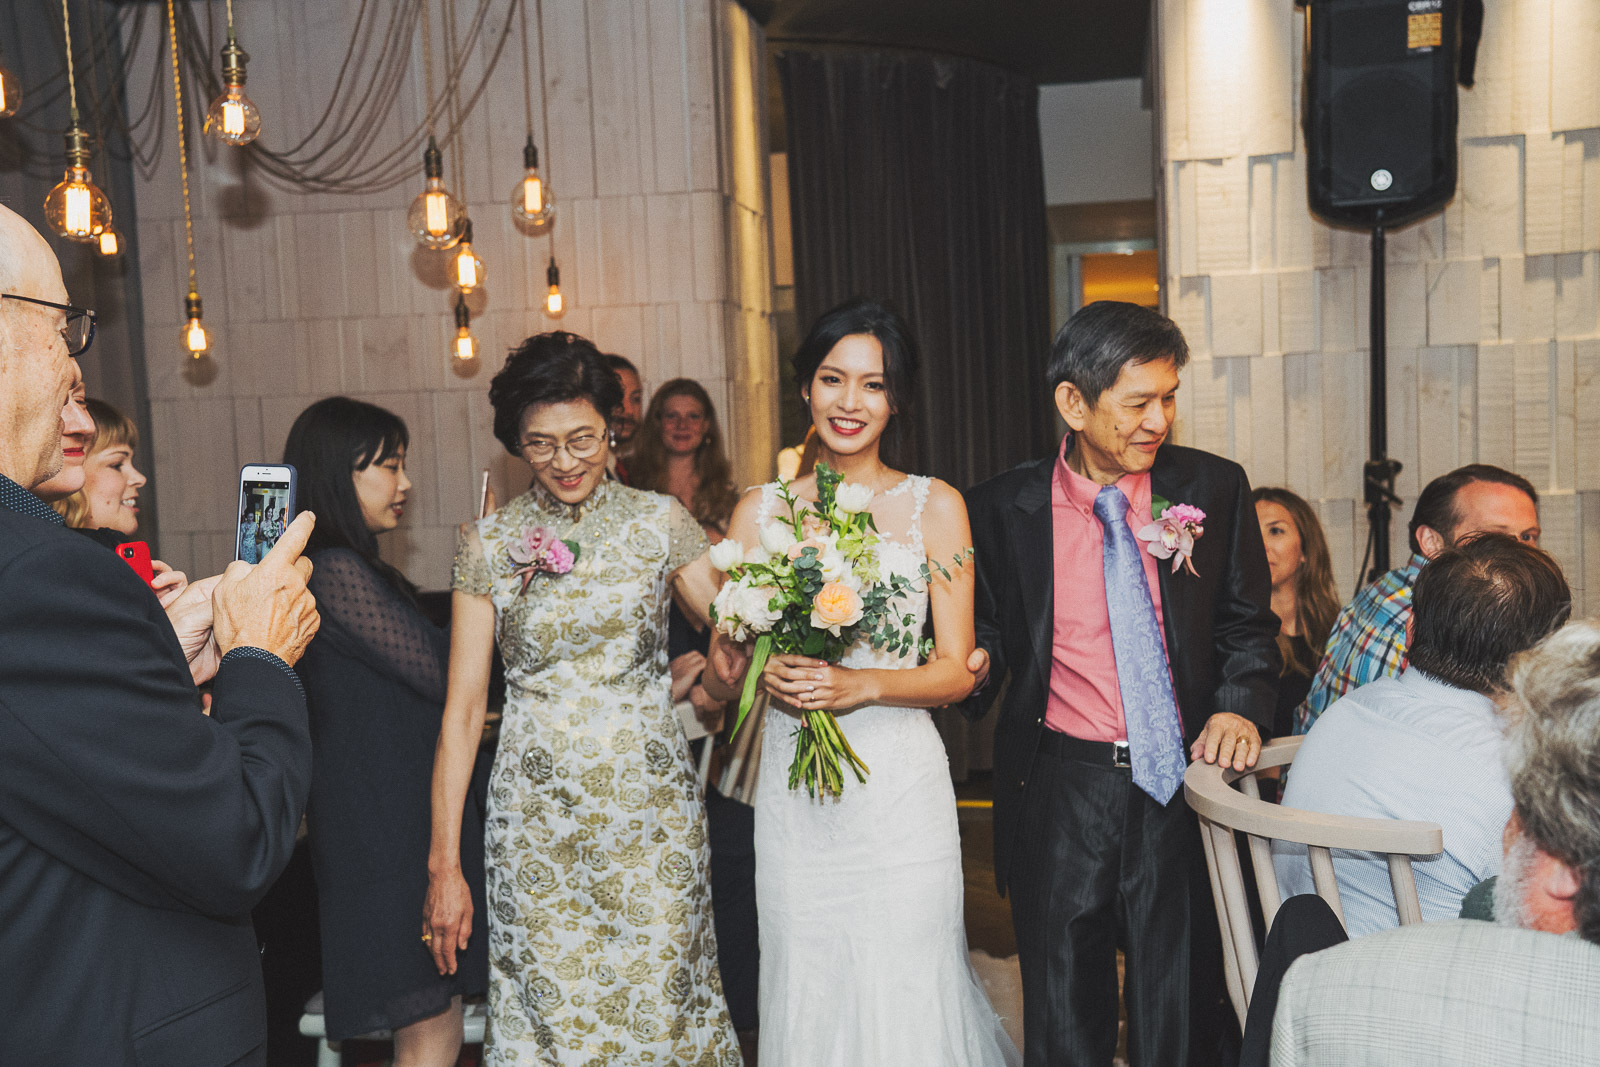 wedding photo grapher